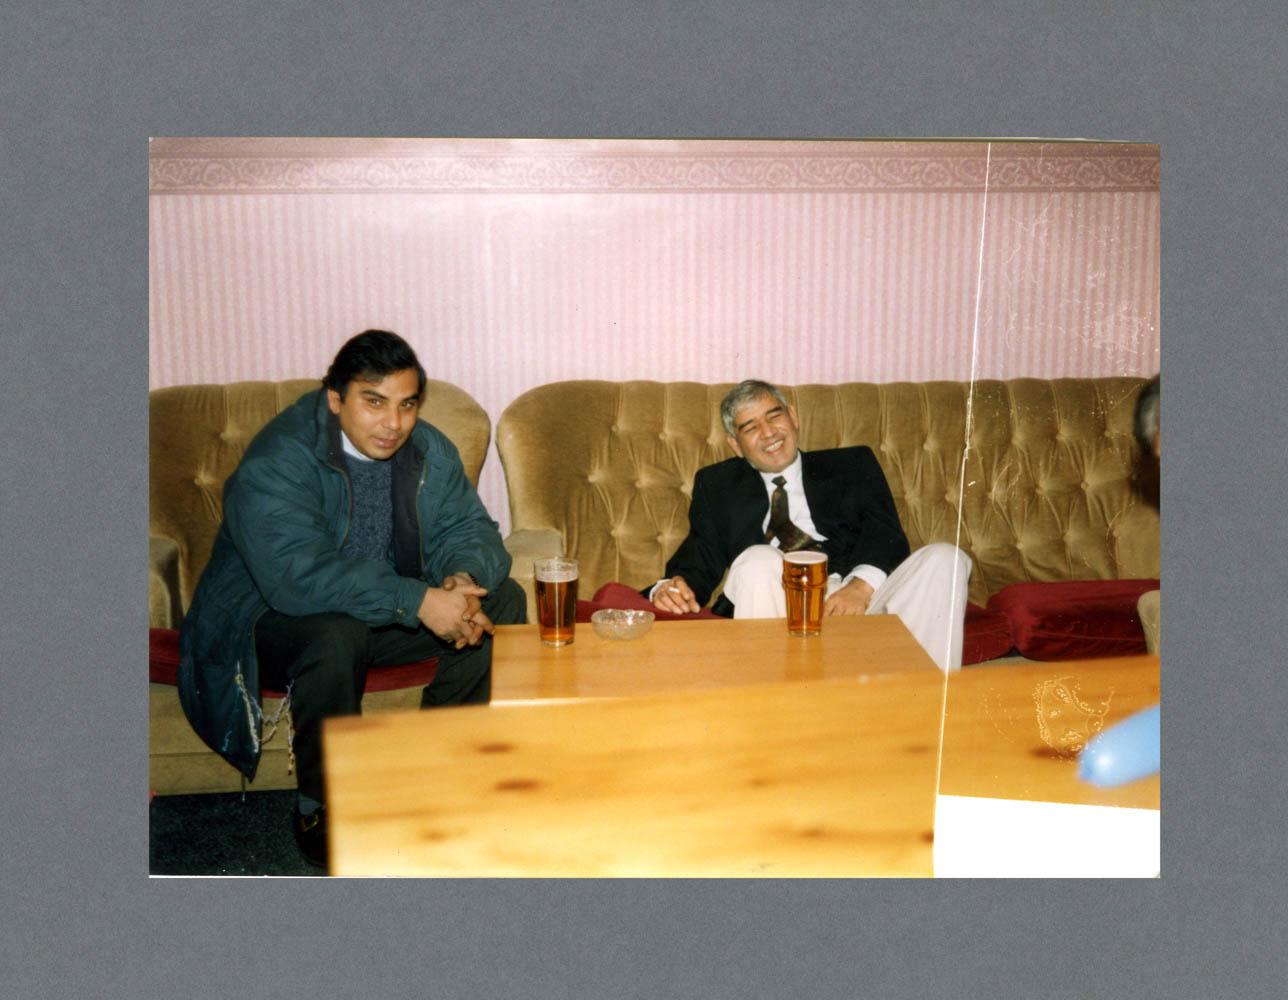 Angel Inn, Bilston c.1989